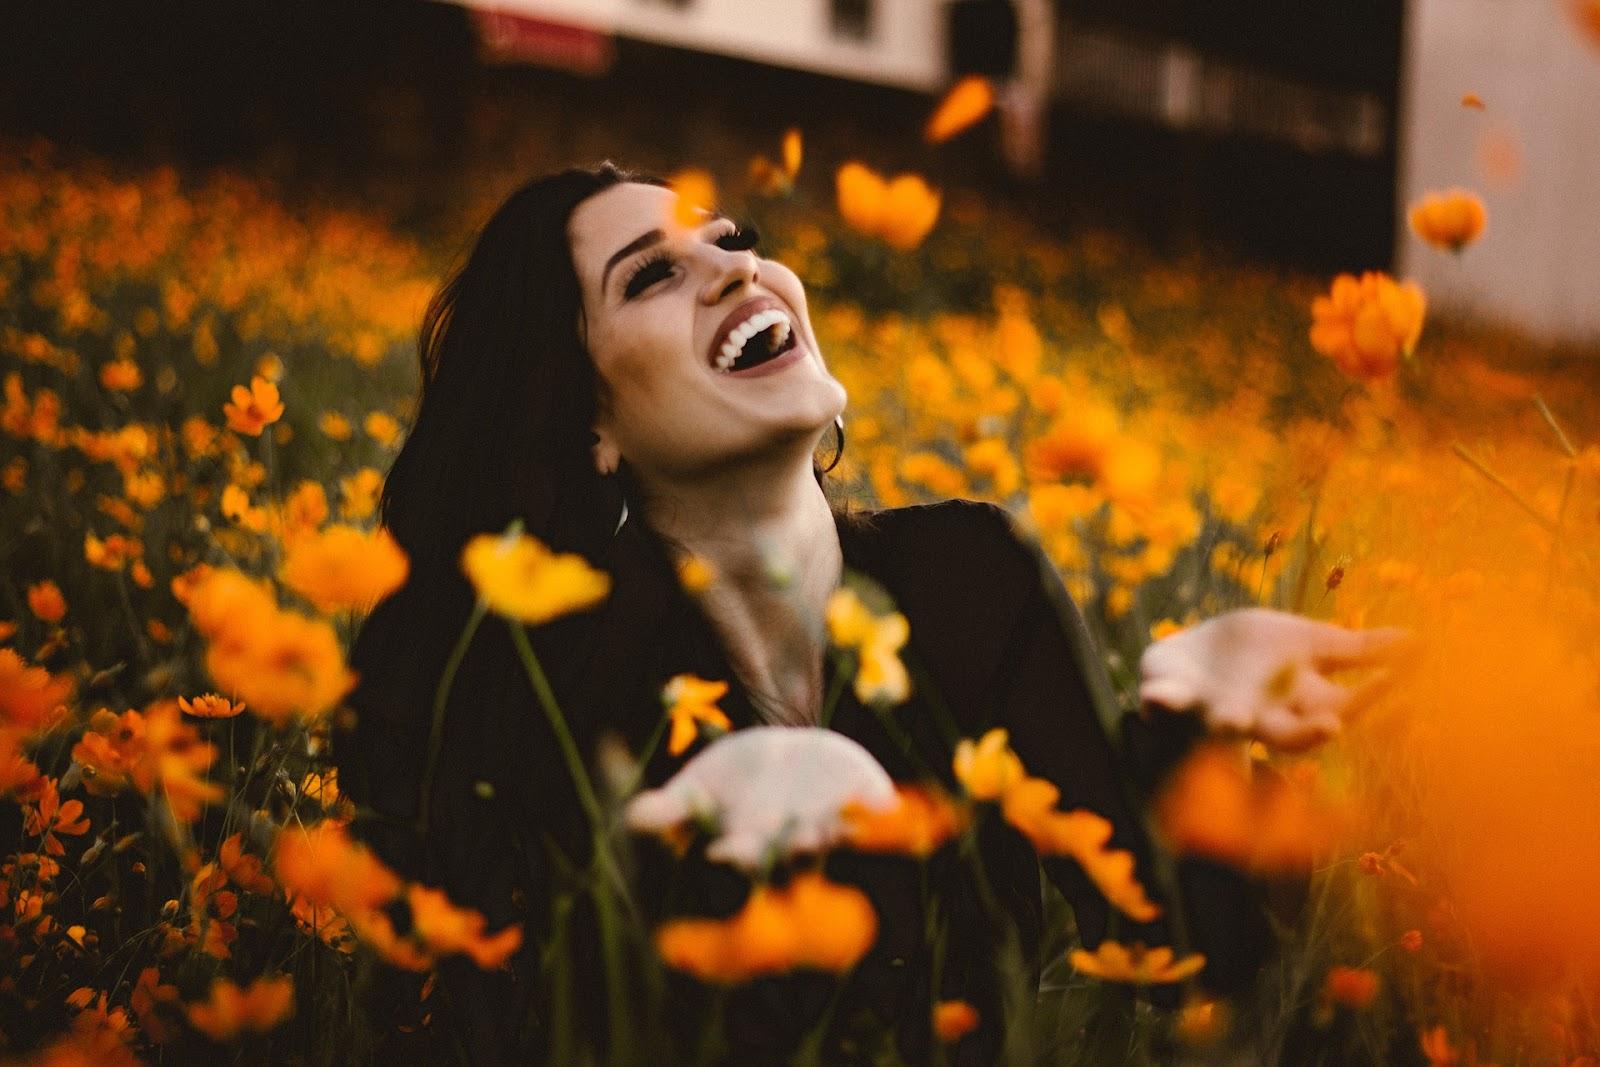 Happy woman among flowers